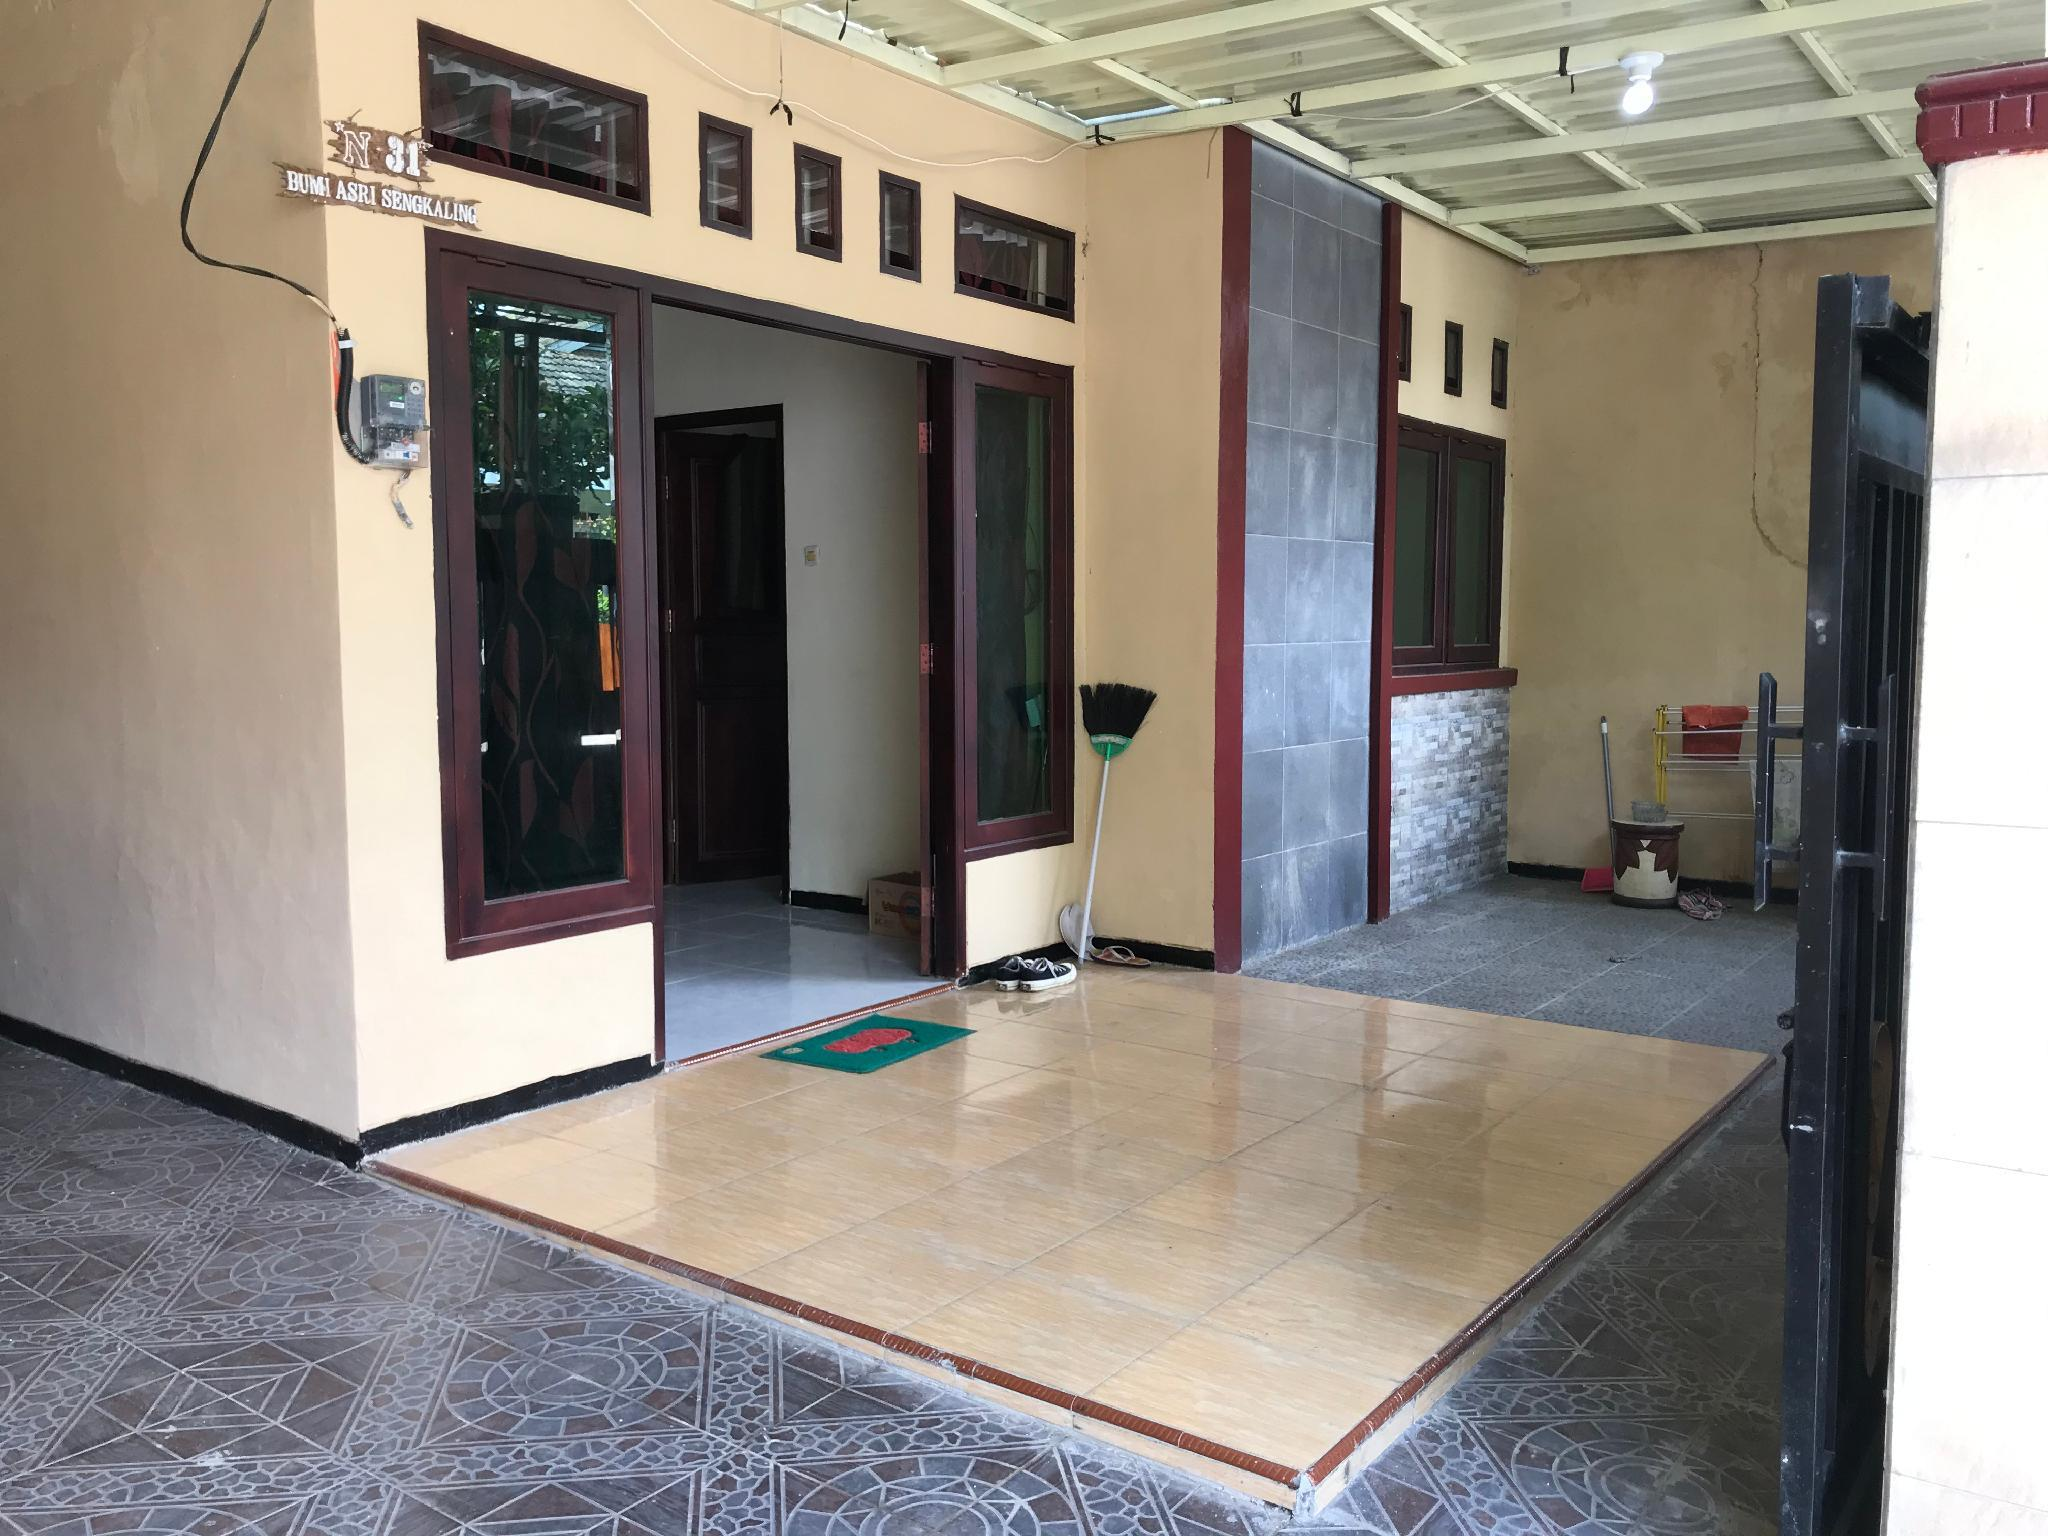 Vila Home Stay Perum Bumi Asri 3 Kamar Tidur, Malang